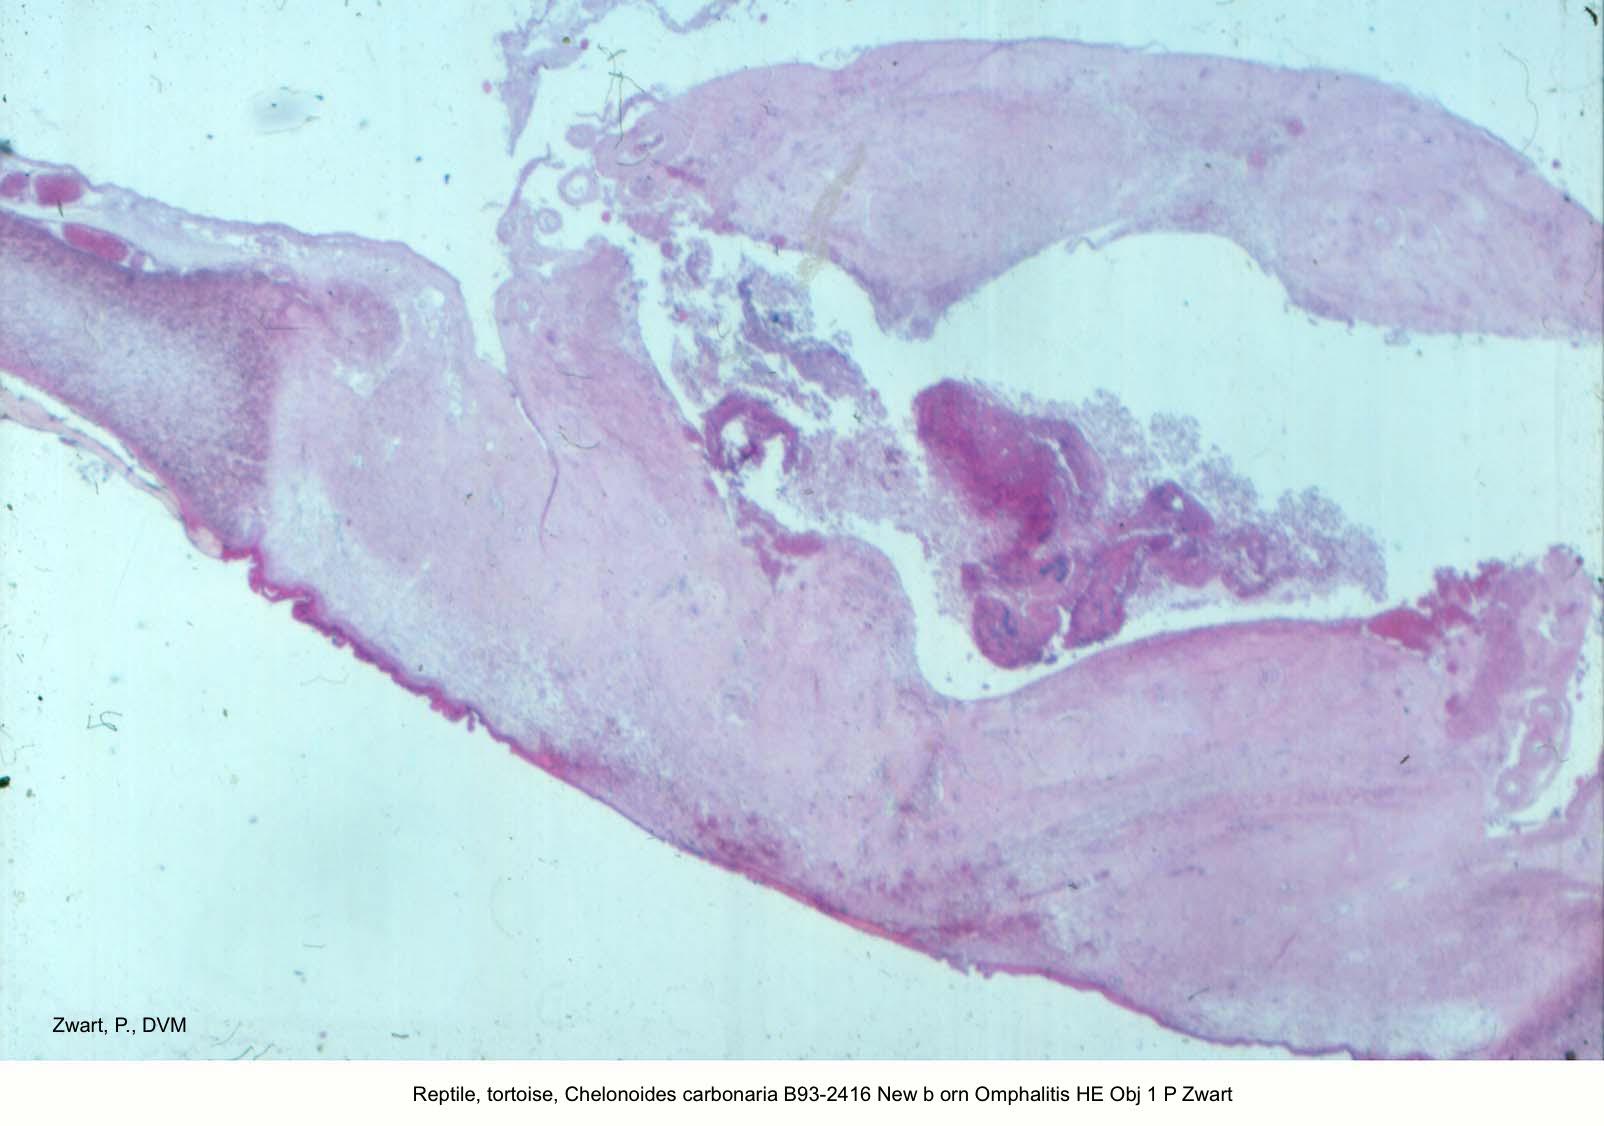 Chelonoides carbonaria B93-2416 Omphalitis HE Obj 1 P Zwart kopie